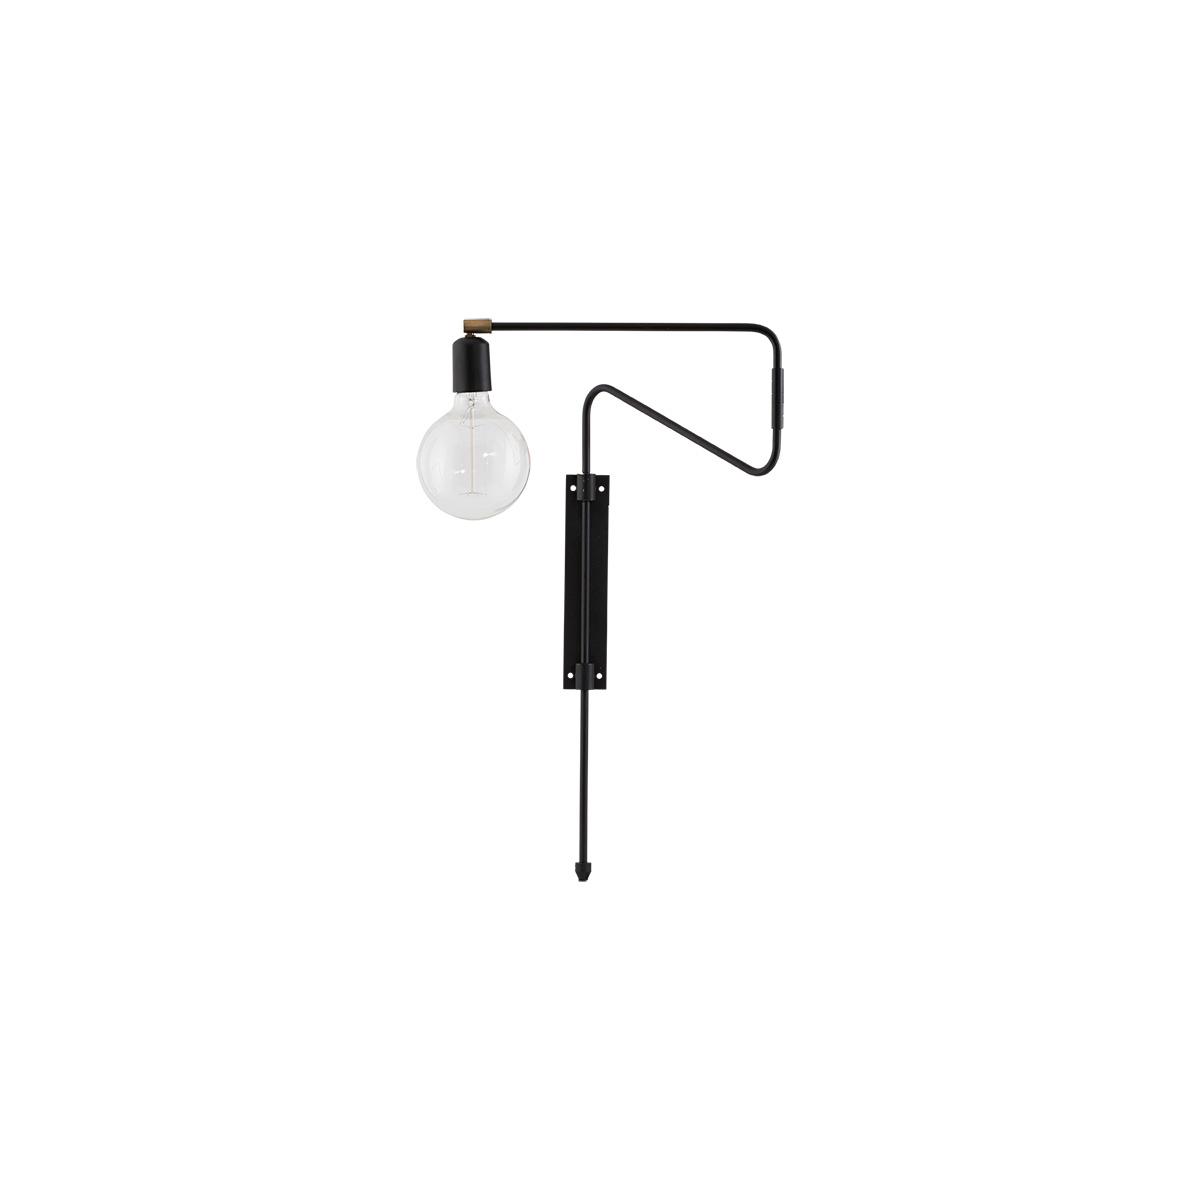 Swing Vägglampa Svart 35 cm